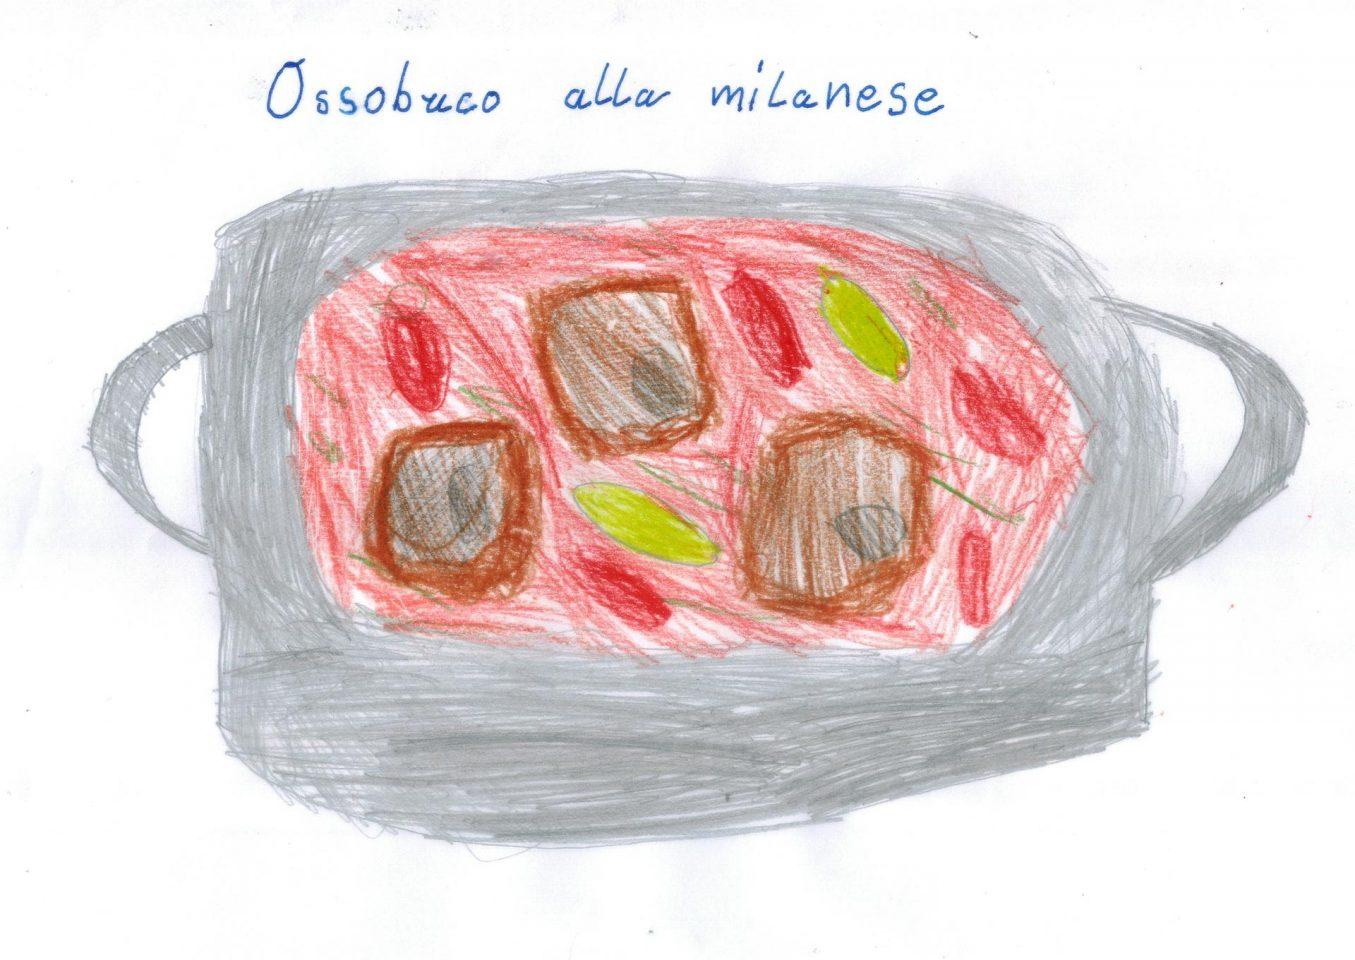 Ians Favorite Ossobucco alla milanese